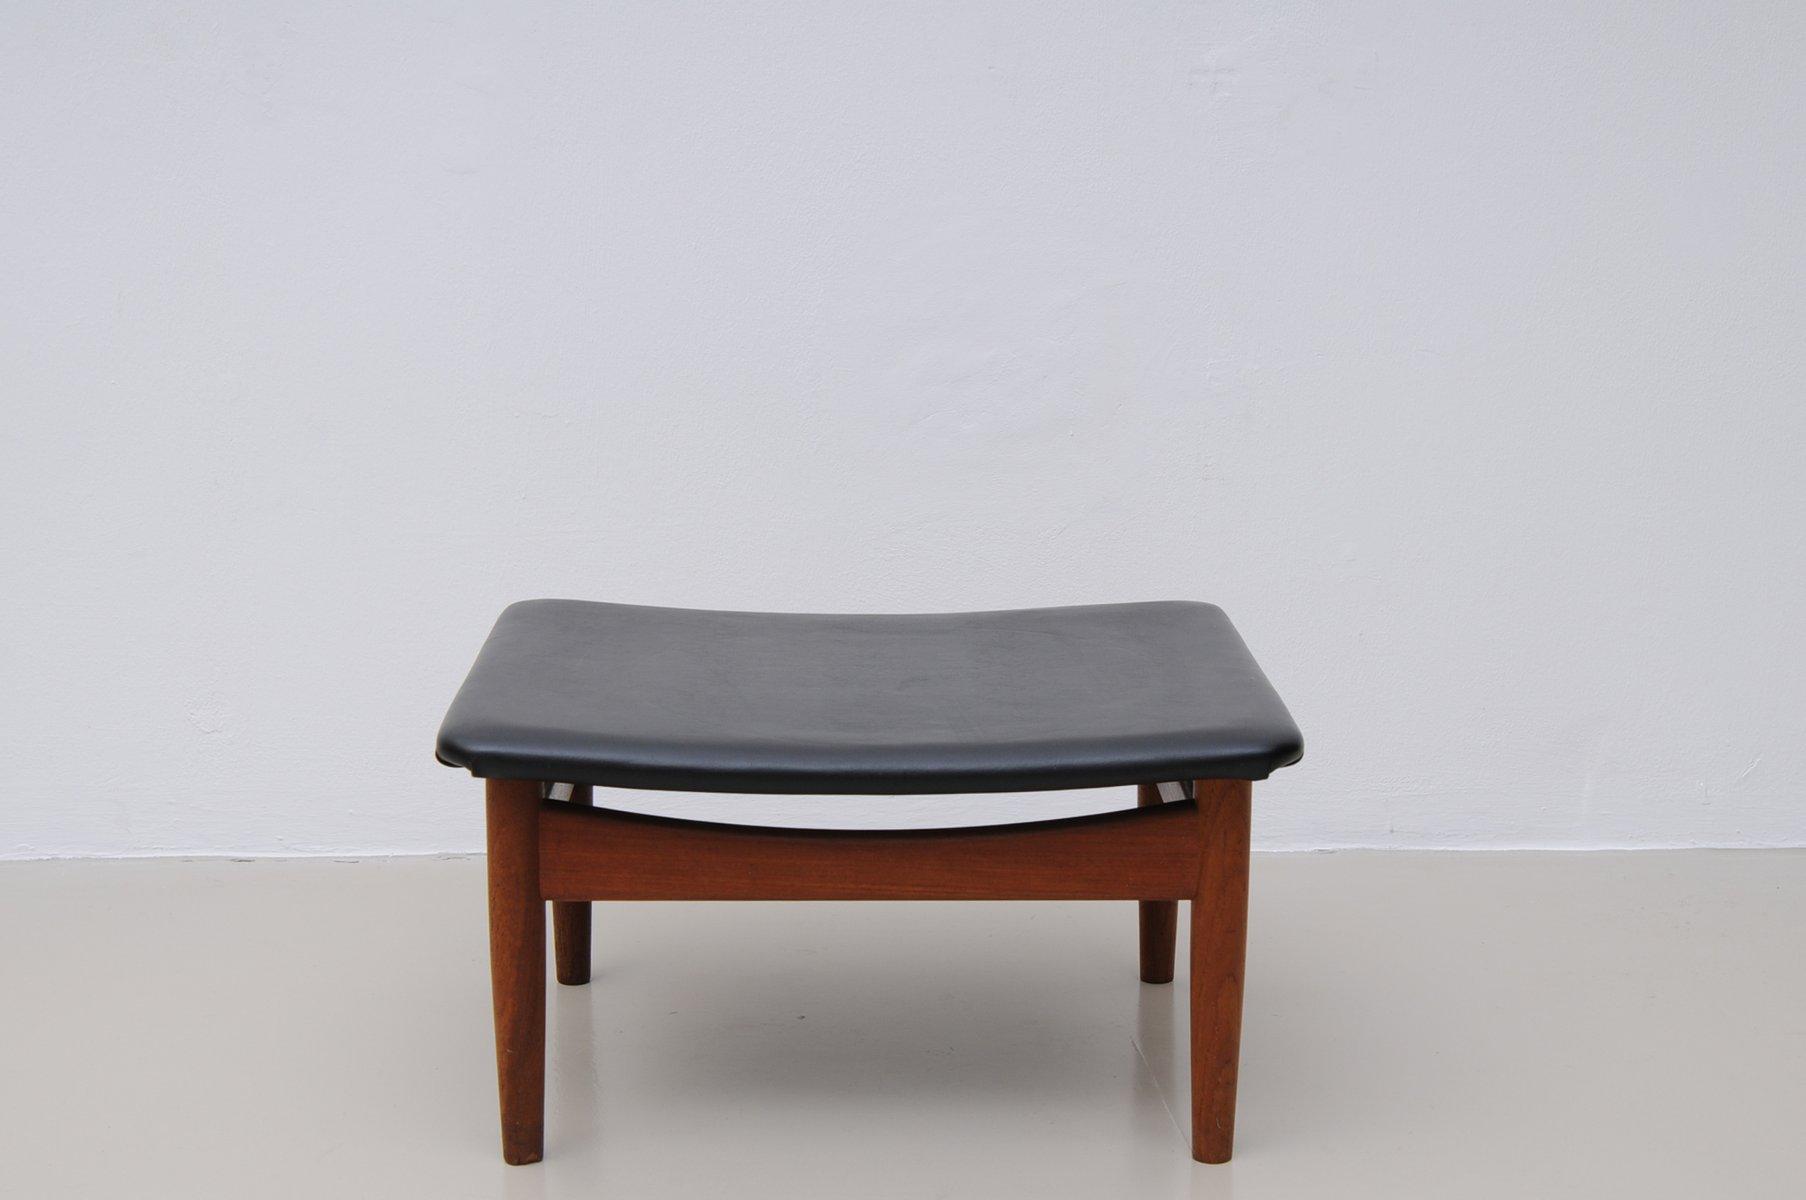 d nischer fd 137 japan series stuhl aus teakholz und skai. Black Bedroom Furniture Sets. Home Design Ideas